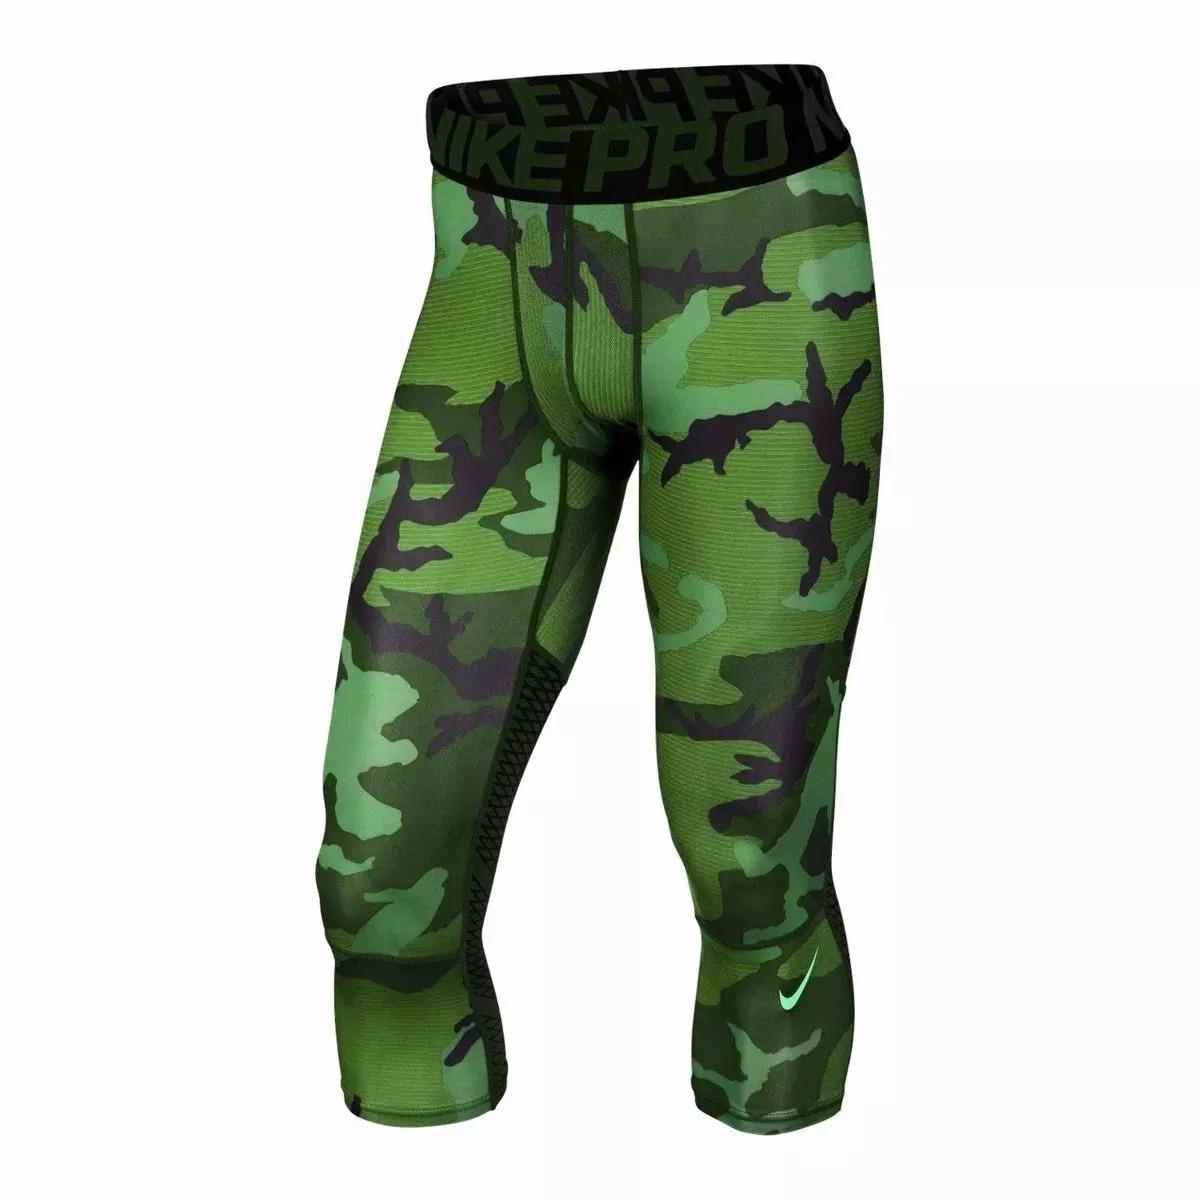 efce7acfaf Calça Nike 3 4 Termica Pro Hypercool Tam. P - V2mshop - R  149